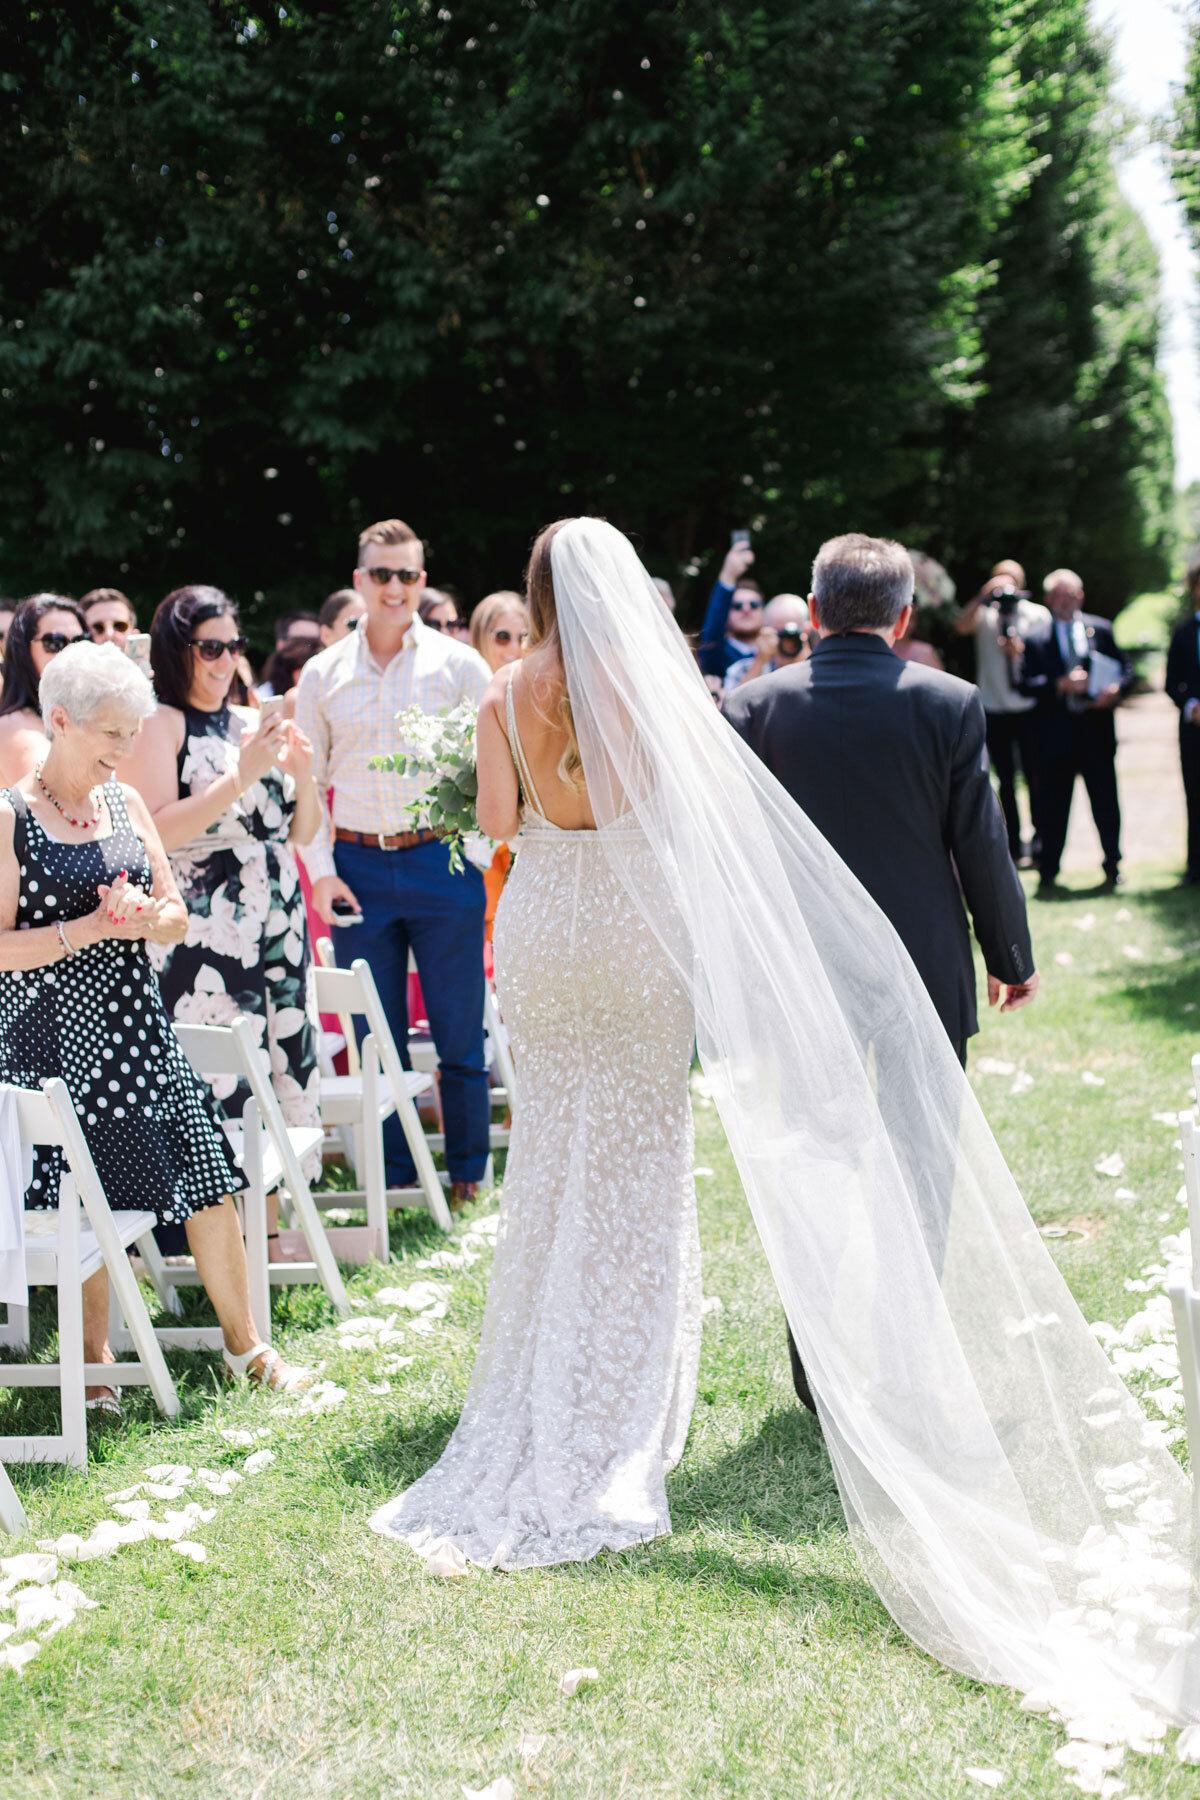 Chateau-des-Charmes-Wedding-Summer-Vineyard-Bride-Niagara-on-the-Lake-photos-by-Gemini-Photography-Ontario-0016.jpg